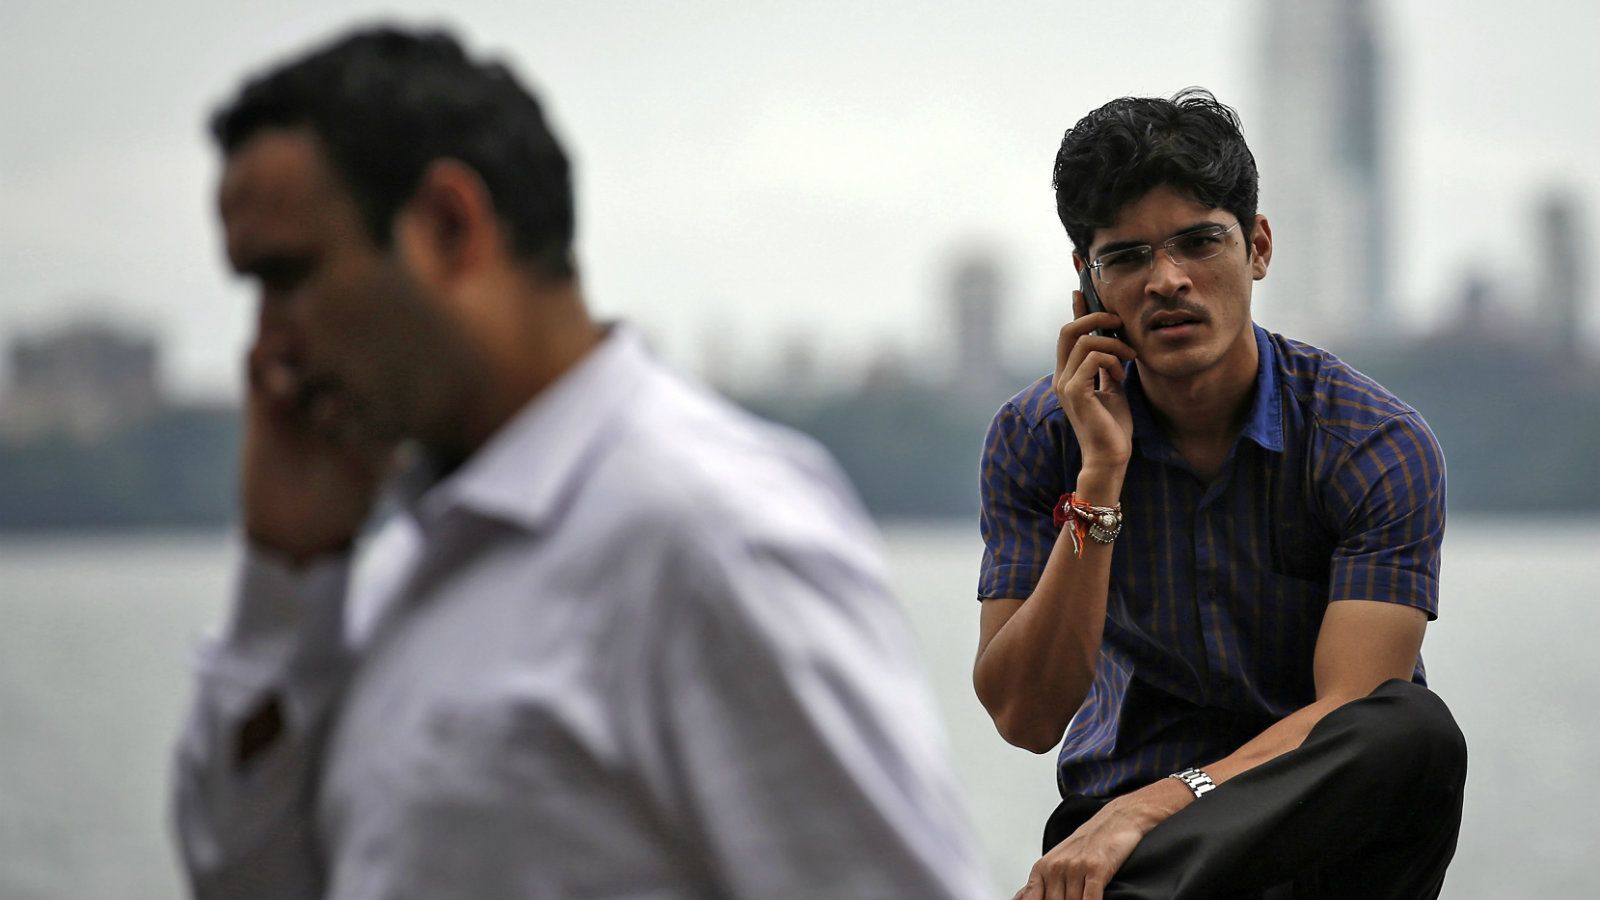 Men speak on their mobile phones in Mumbai August 28, 2014. Credit: Reuters